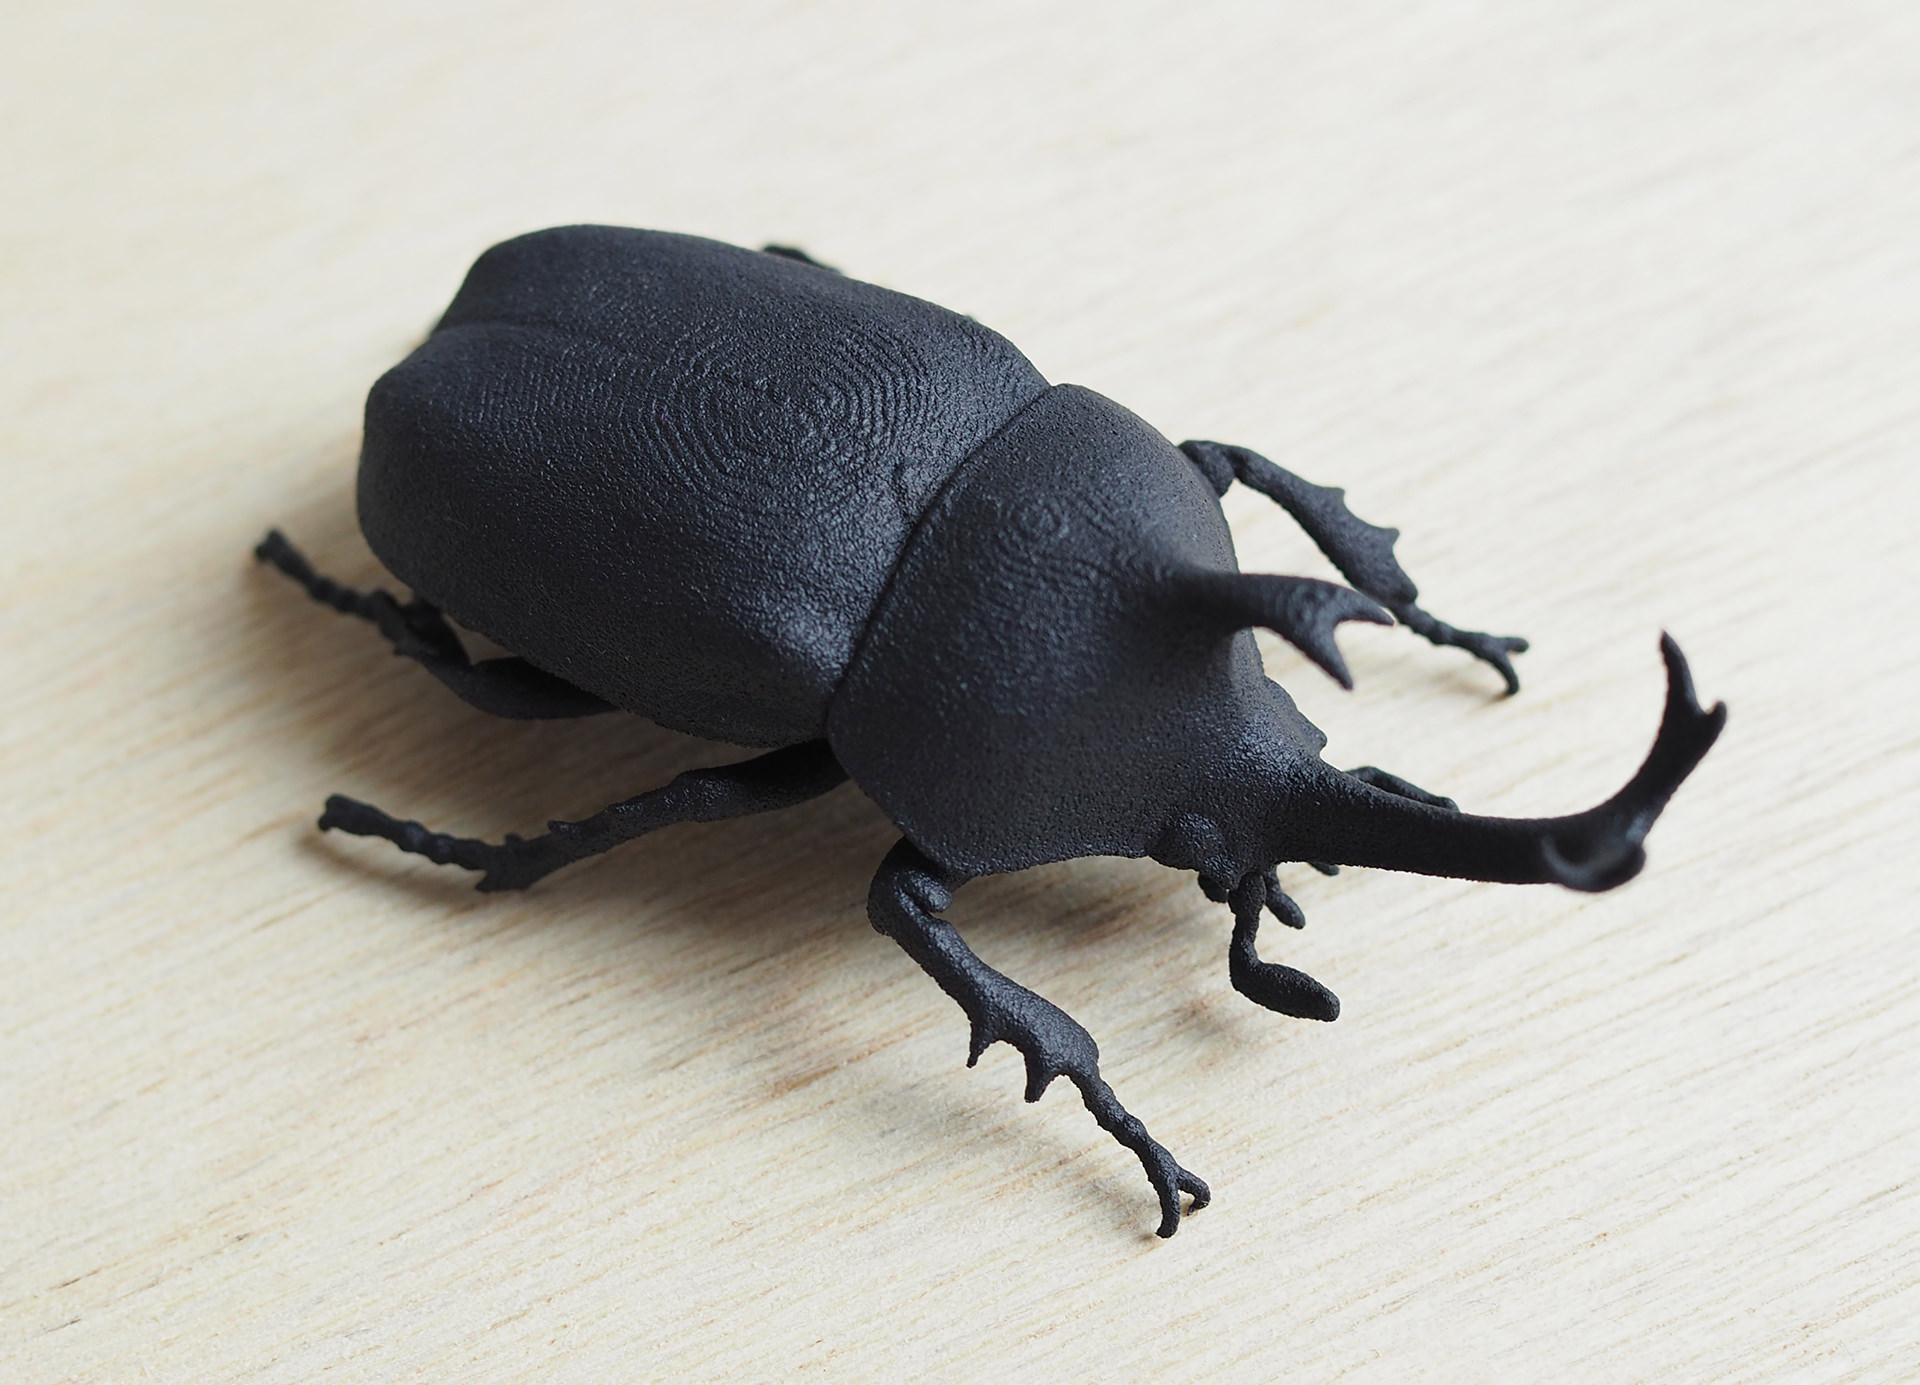 3d-printing-beetle-idarts-3